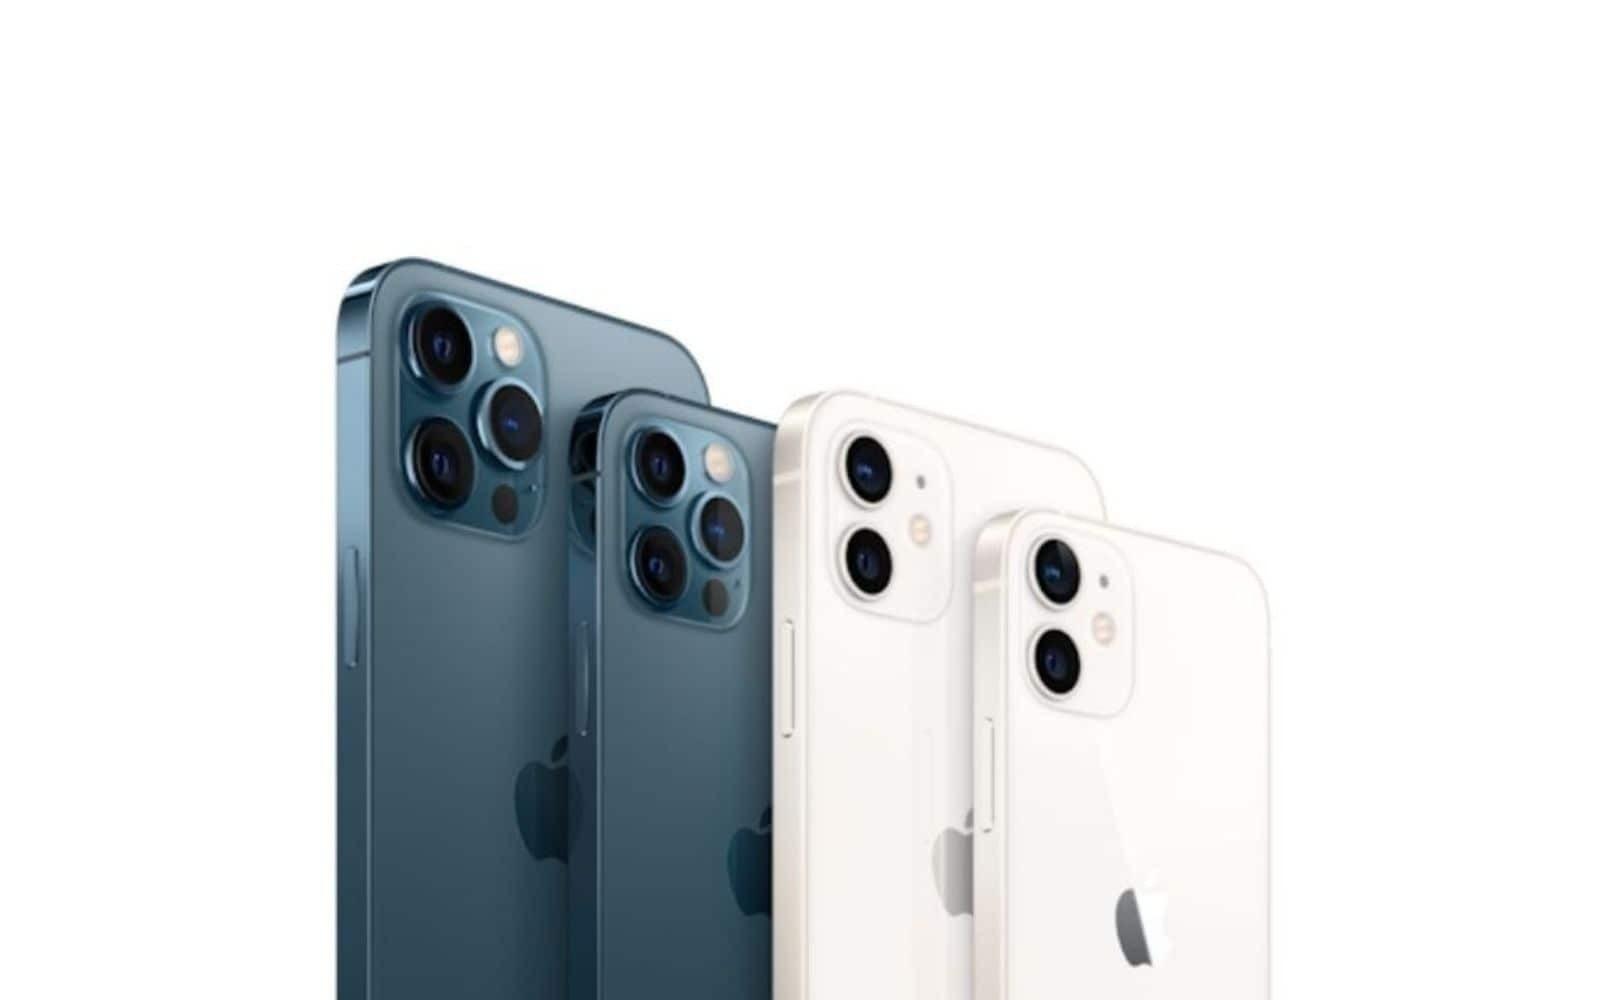 Apple Perkenalkan iPhone 13, Diperkuat Cip Smartphone Tercepat!